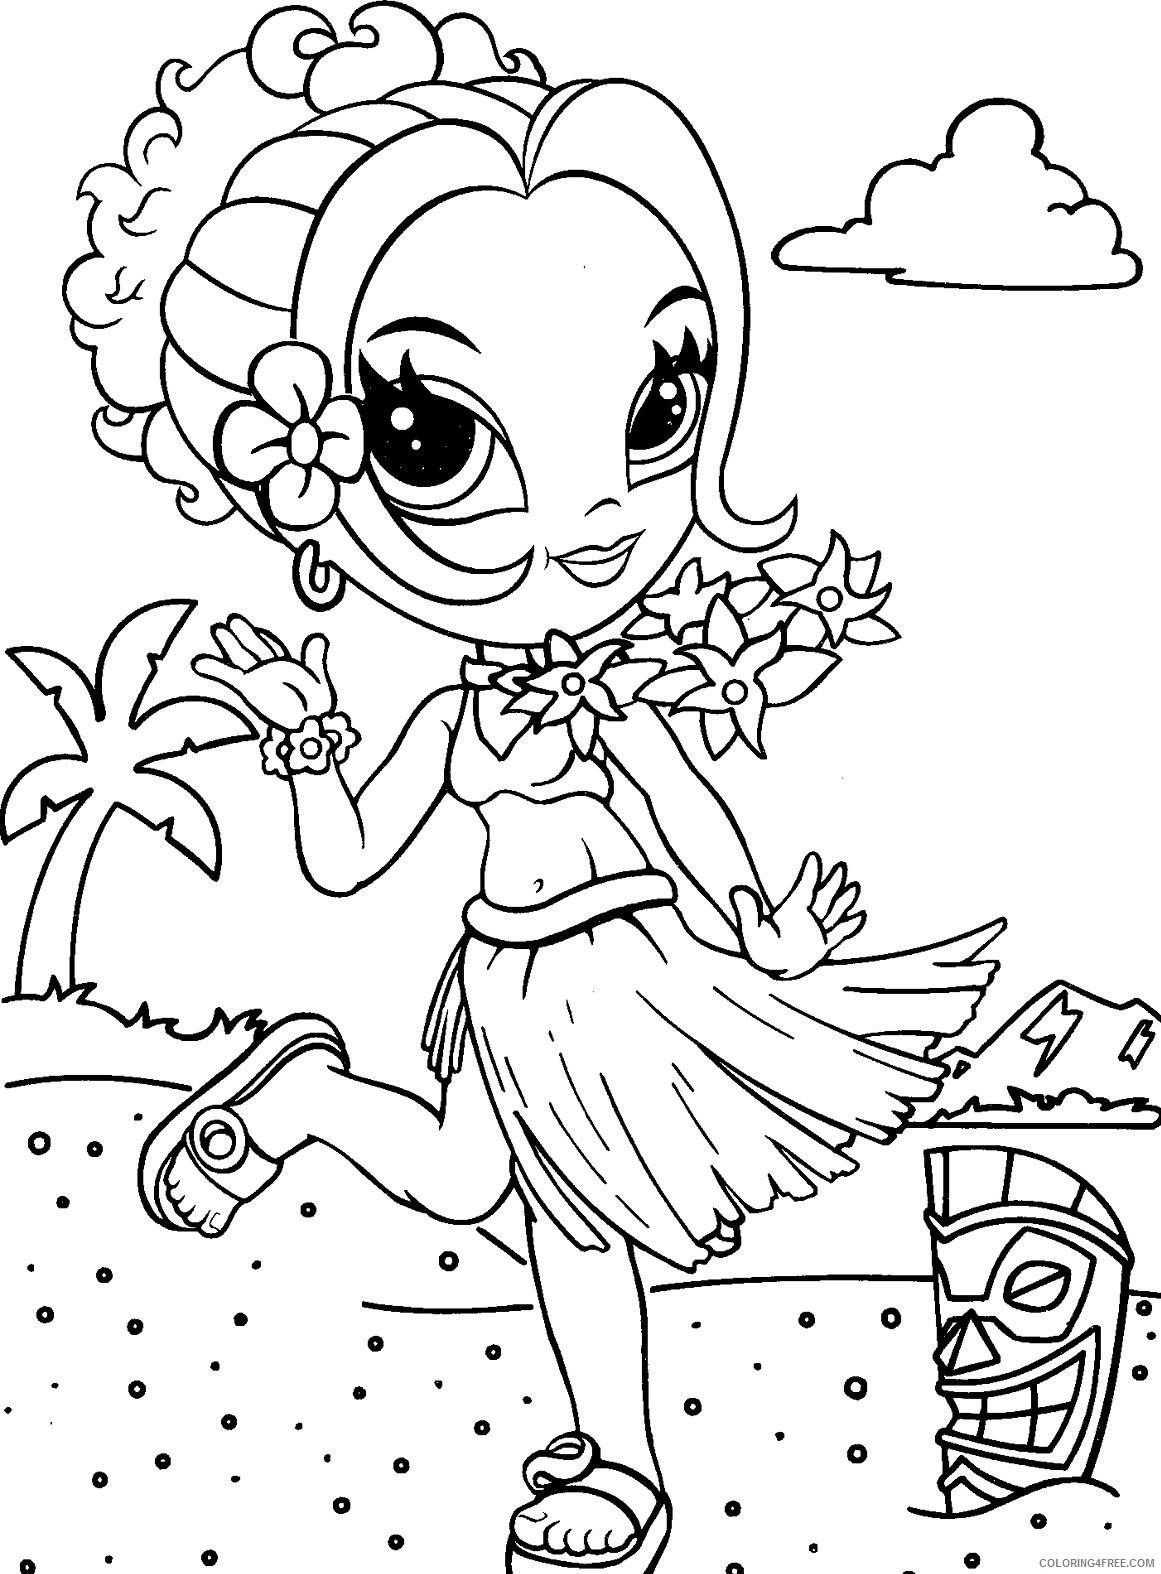 lisa frank coloring pages girl at hawaii beach Coloring4free